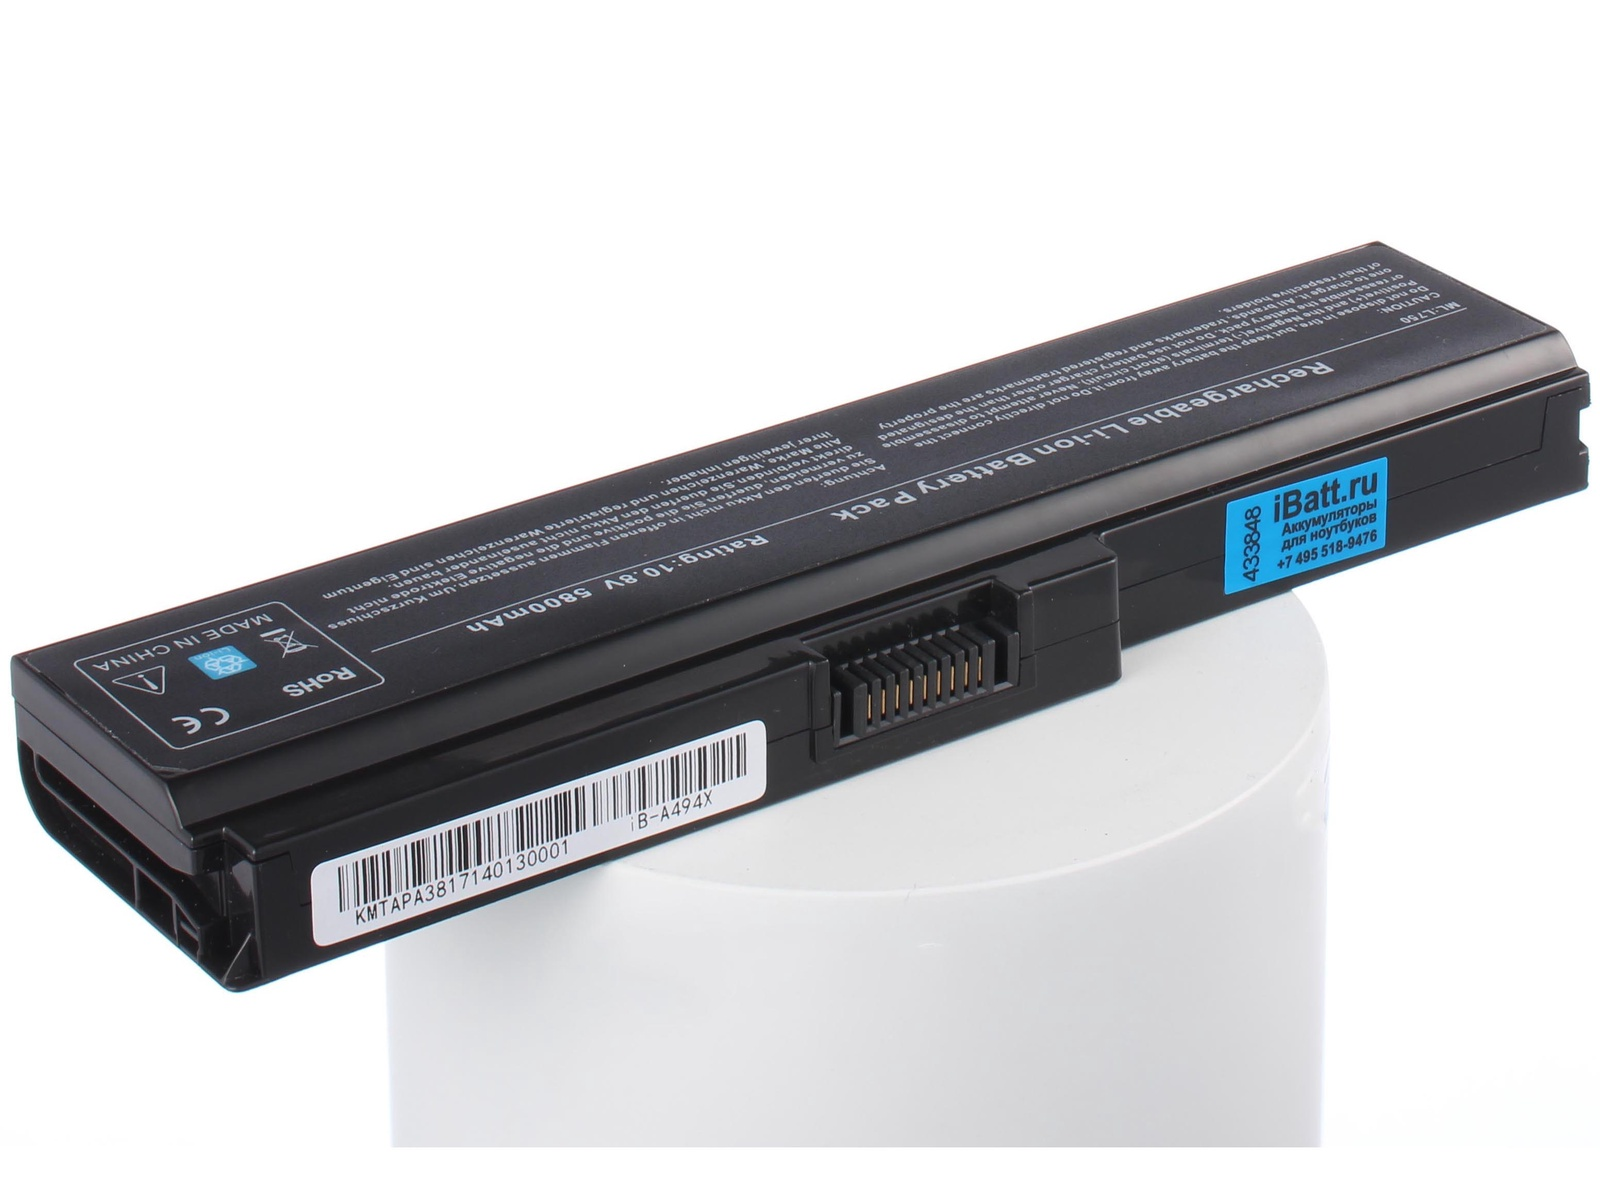 цены на Аккумулятор для ноутбука iBatt для ToshiBa Satellite L750D-12W, Satellite A665D-S6059, Satellite L635-10Z, Satellite L635-12P, Satellite L655-143, Satellite L600, Satellite L655-12W, Satellite L655-145, Satellite A665-14H  в интернет-магазинах